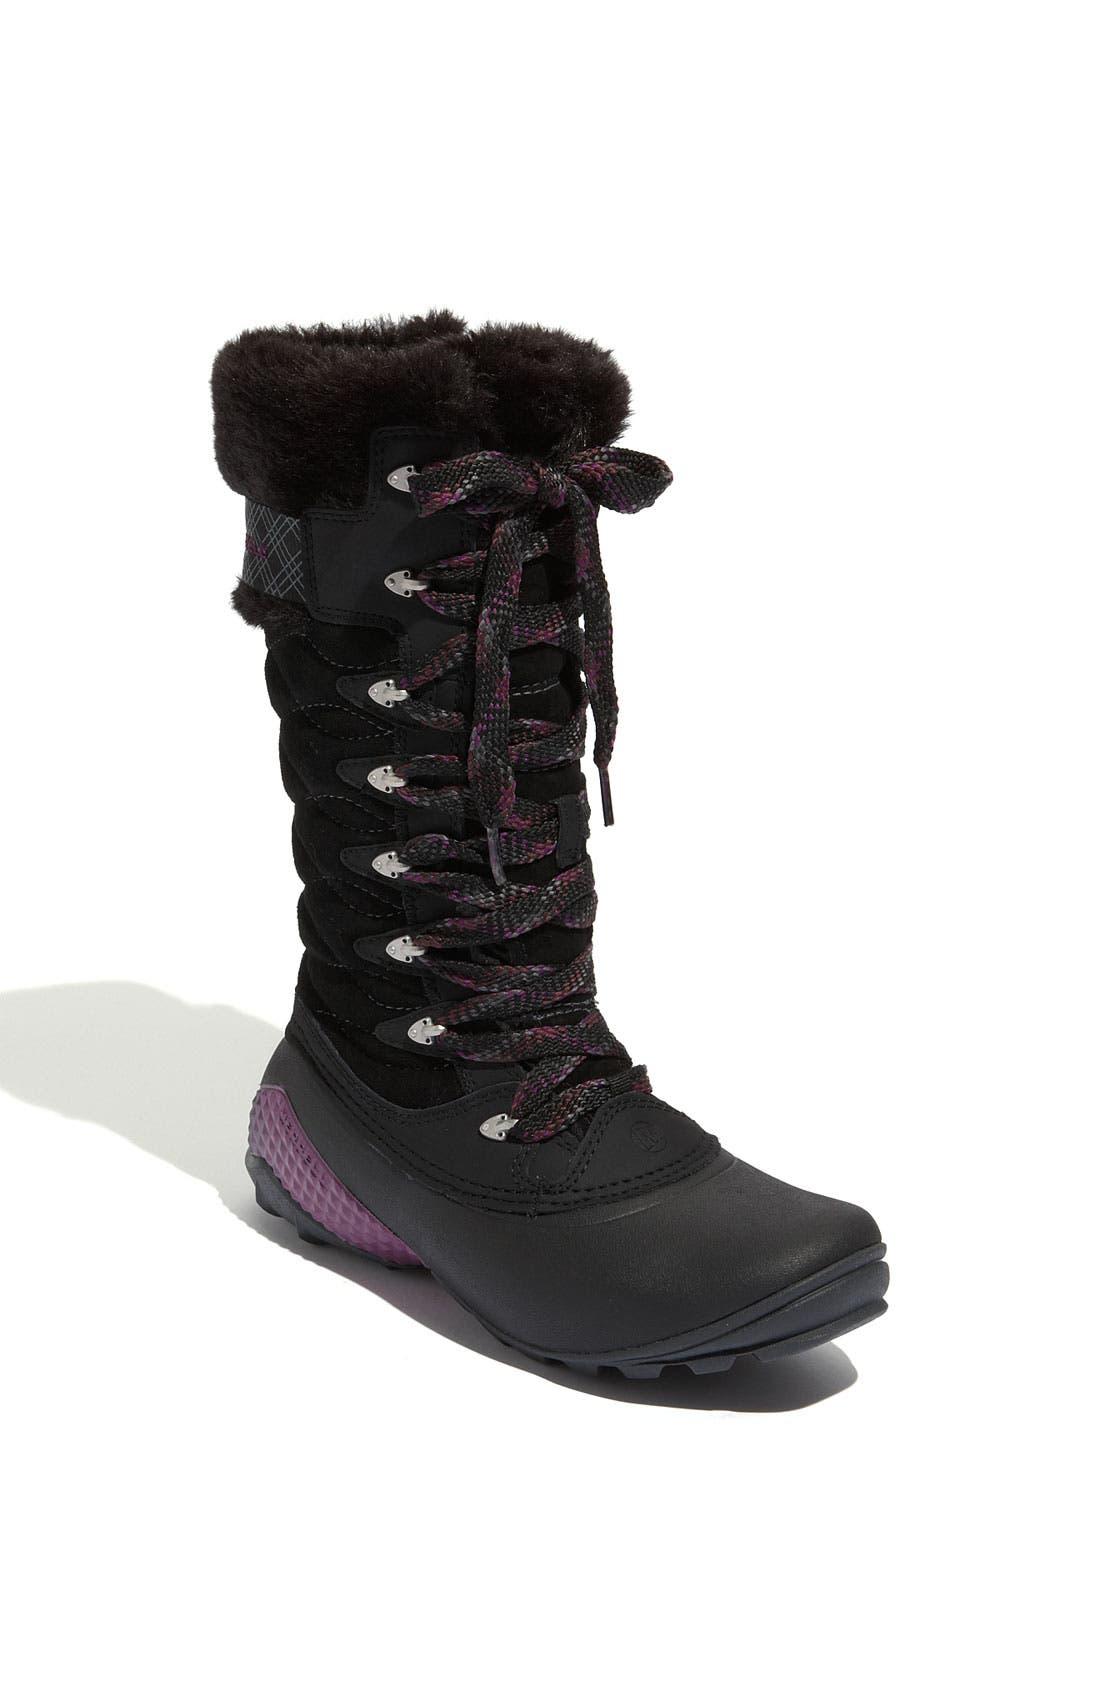 Main Image - Merrell 'Winterbelle Peak' Waterproof Boot